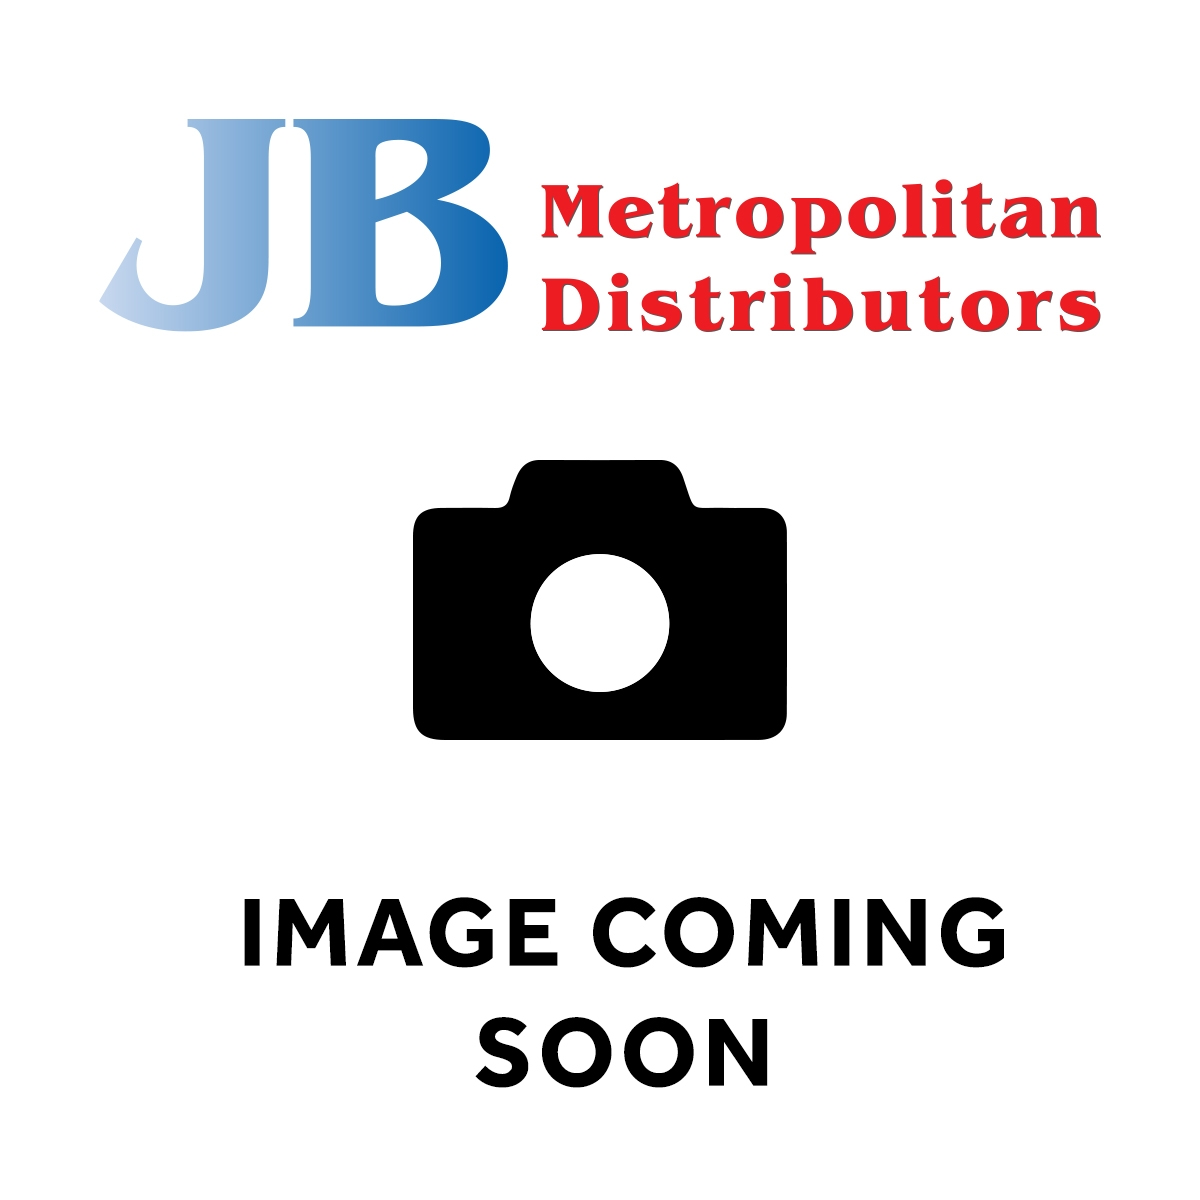 440G M & M PEANUT GIFT BOX